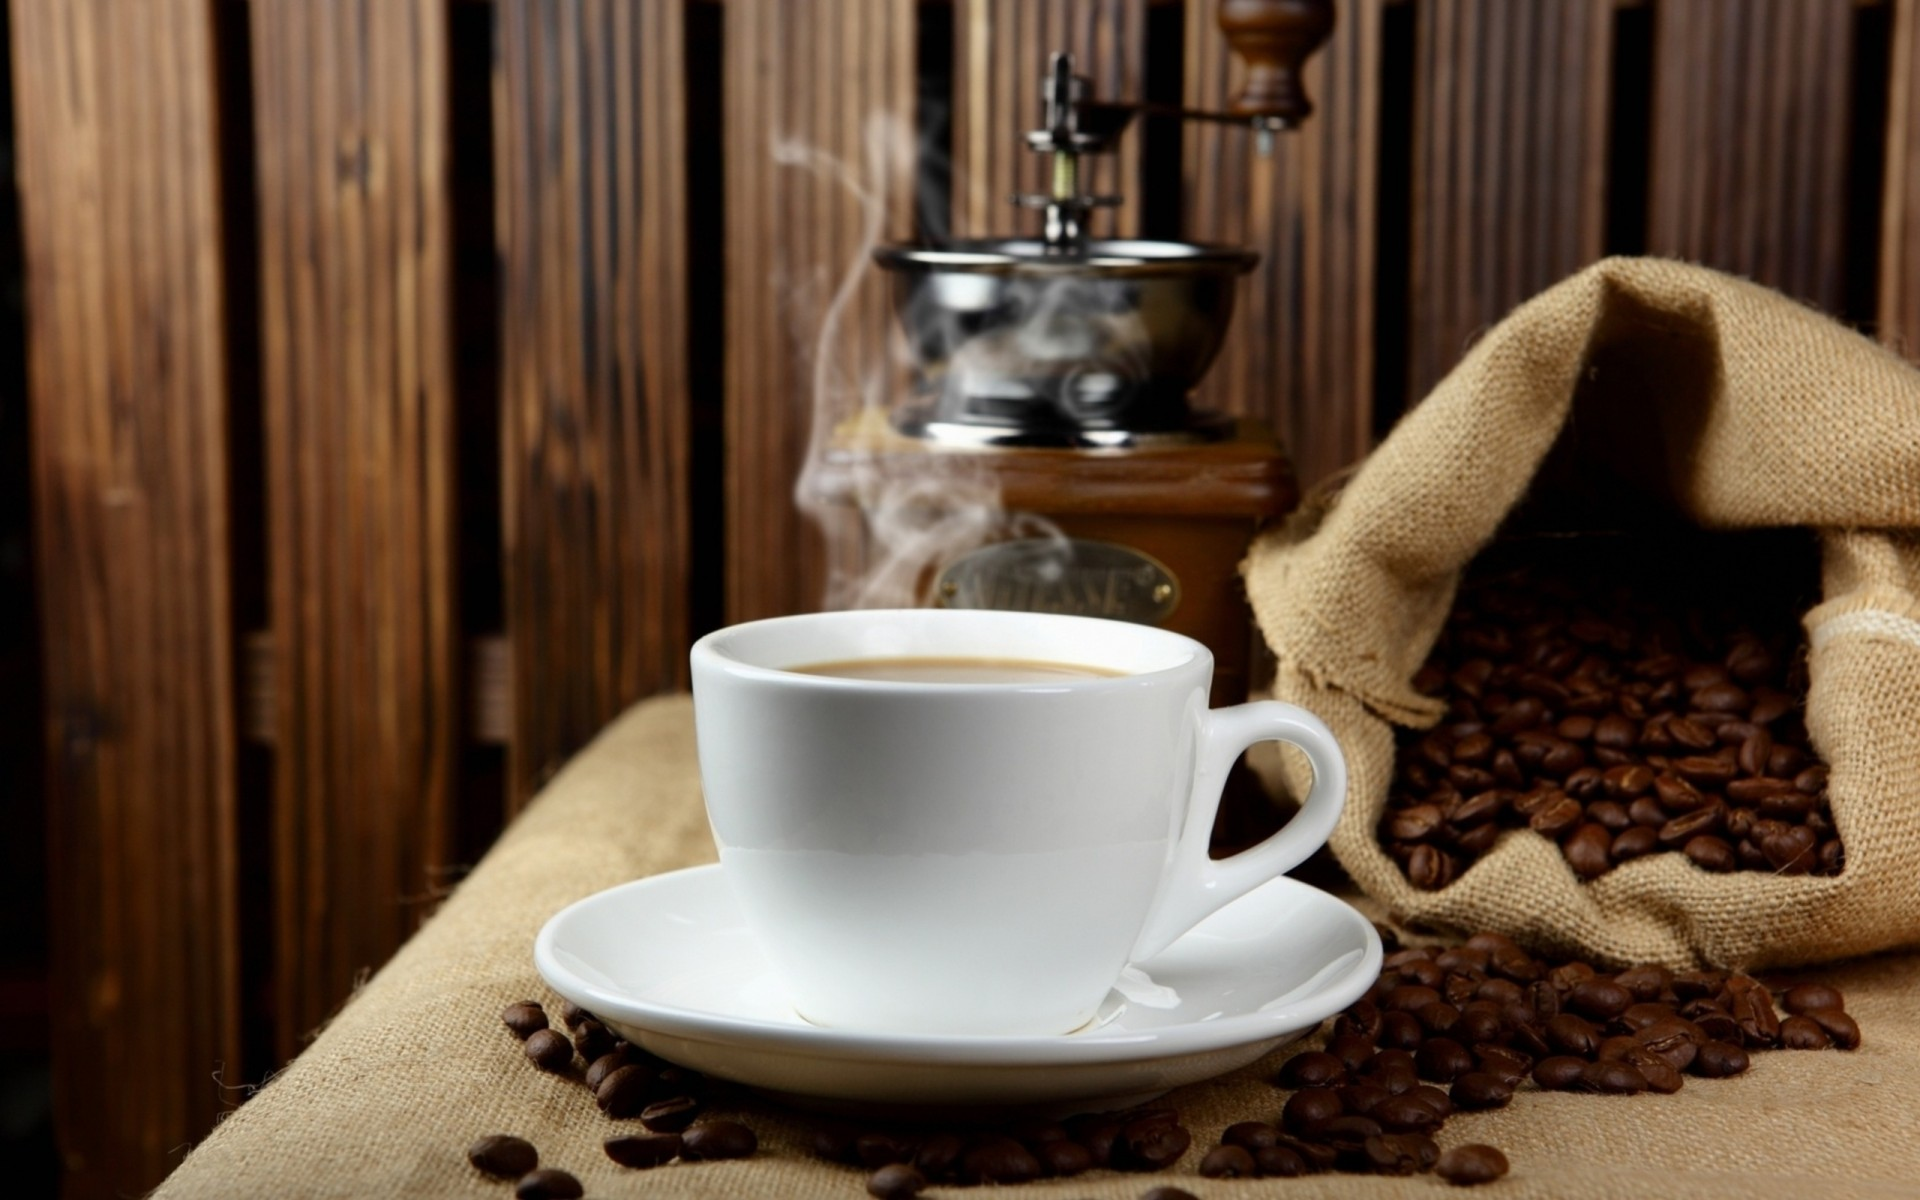 место две чашки кофе и кофейник картинки через